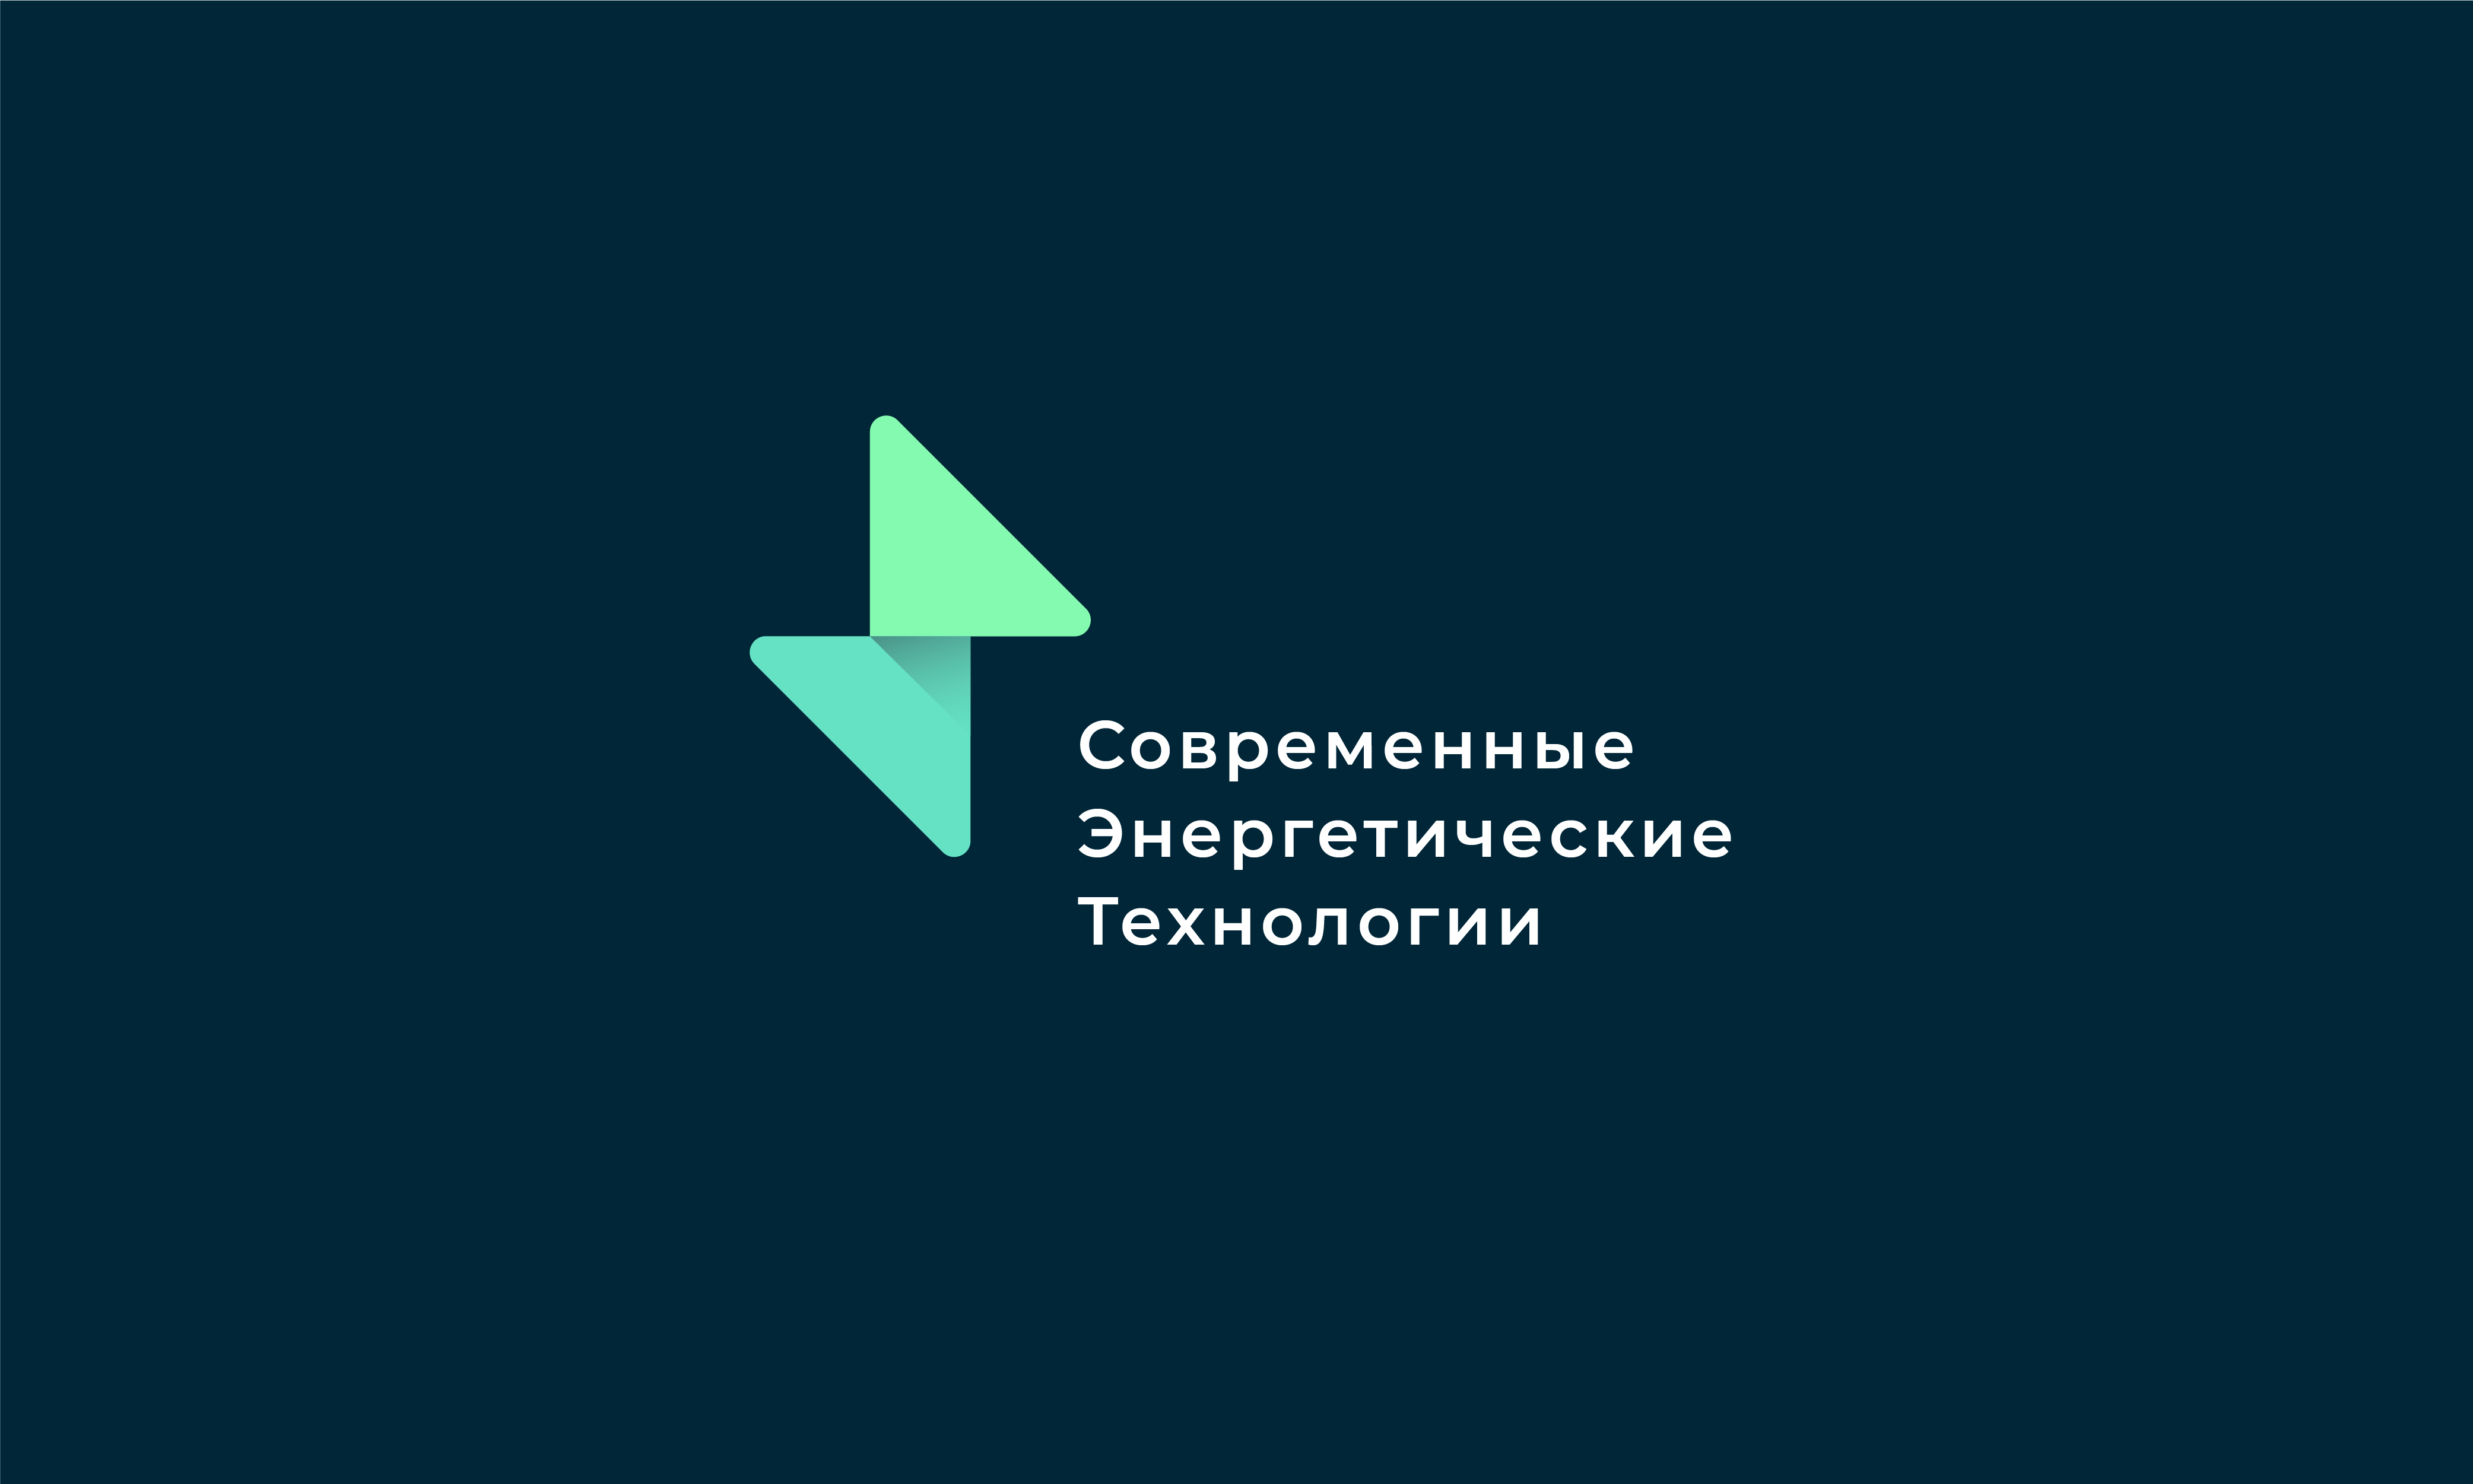 Срочно! Дизайн логотипа ООО «СЭТ» фото f_1805d4eb54ee44a9.jpg